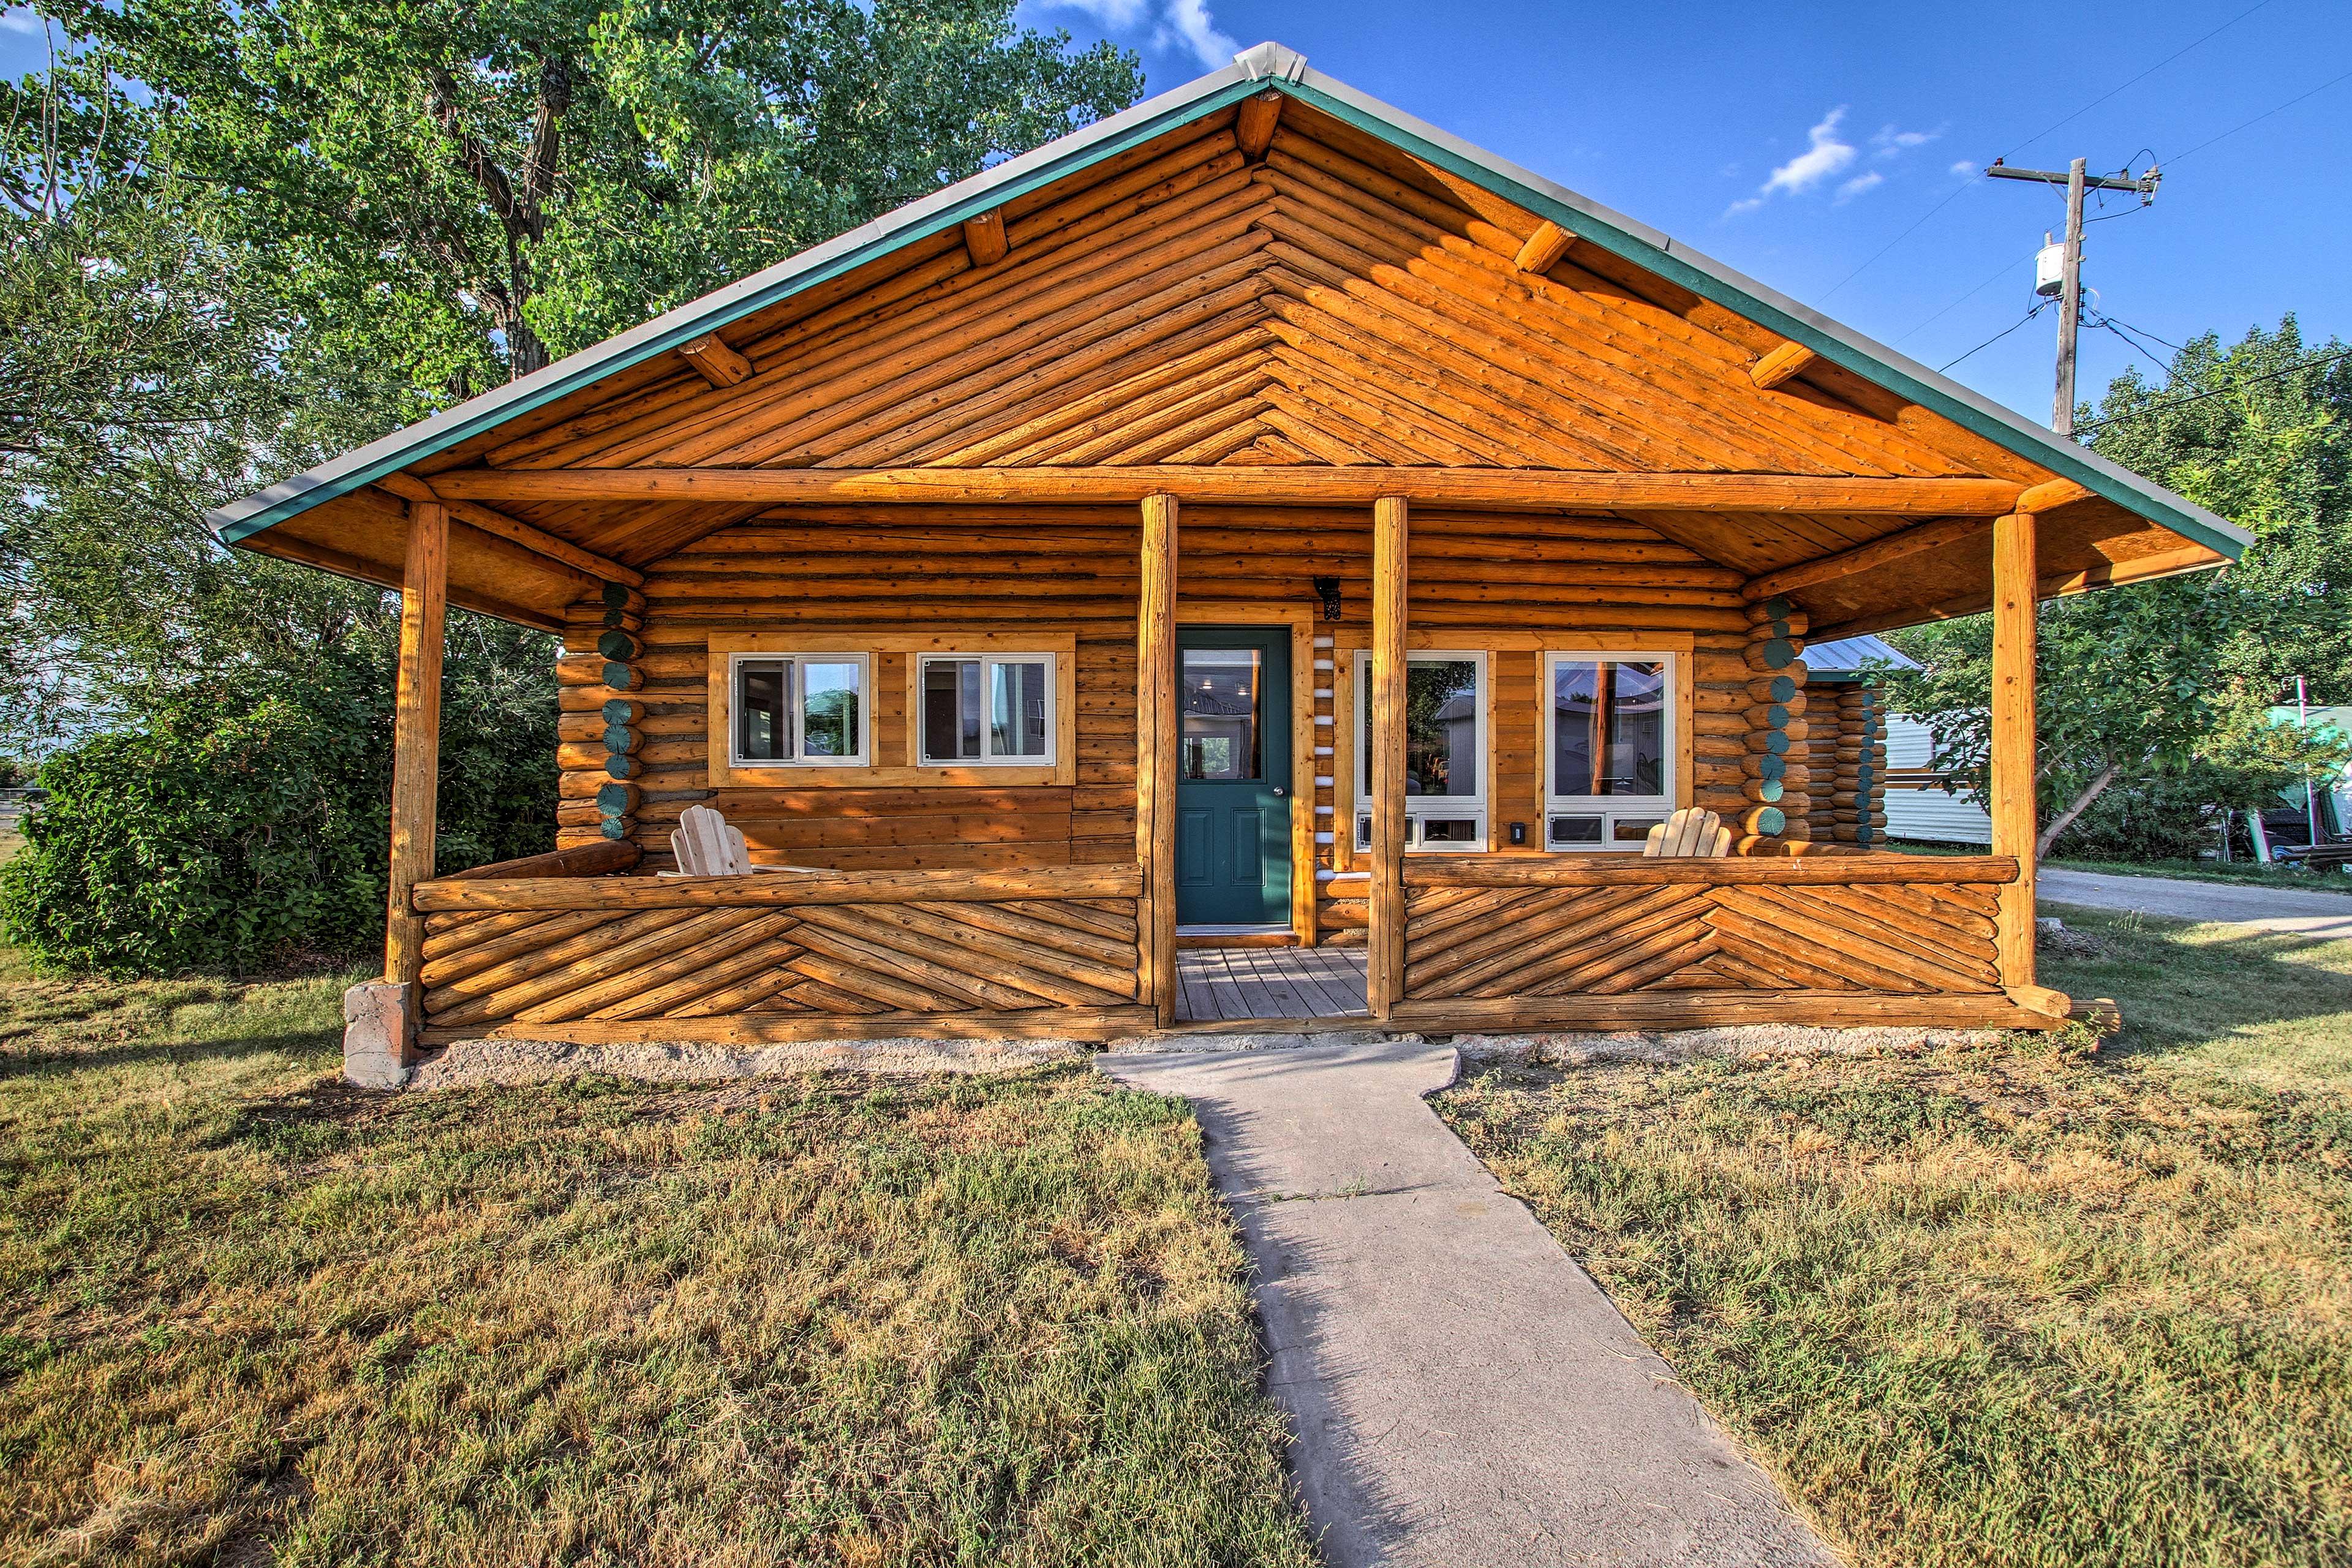 Book your Montana getaway to this 3-bedroom, 1-bath vacation rental cabin!